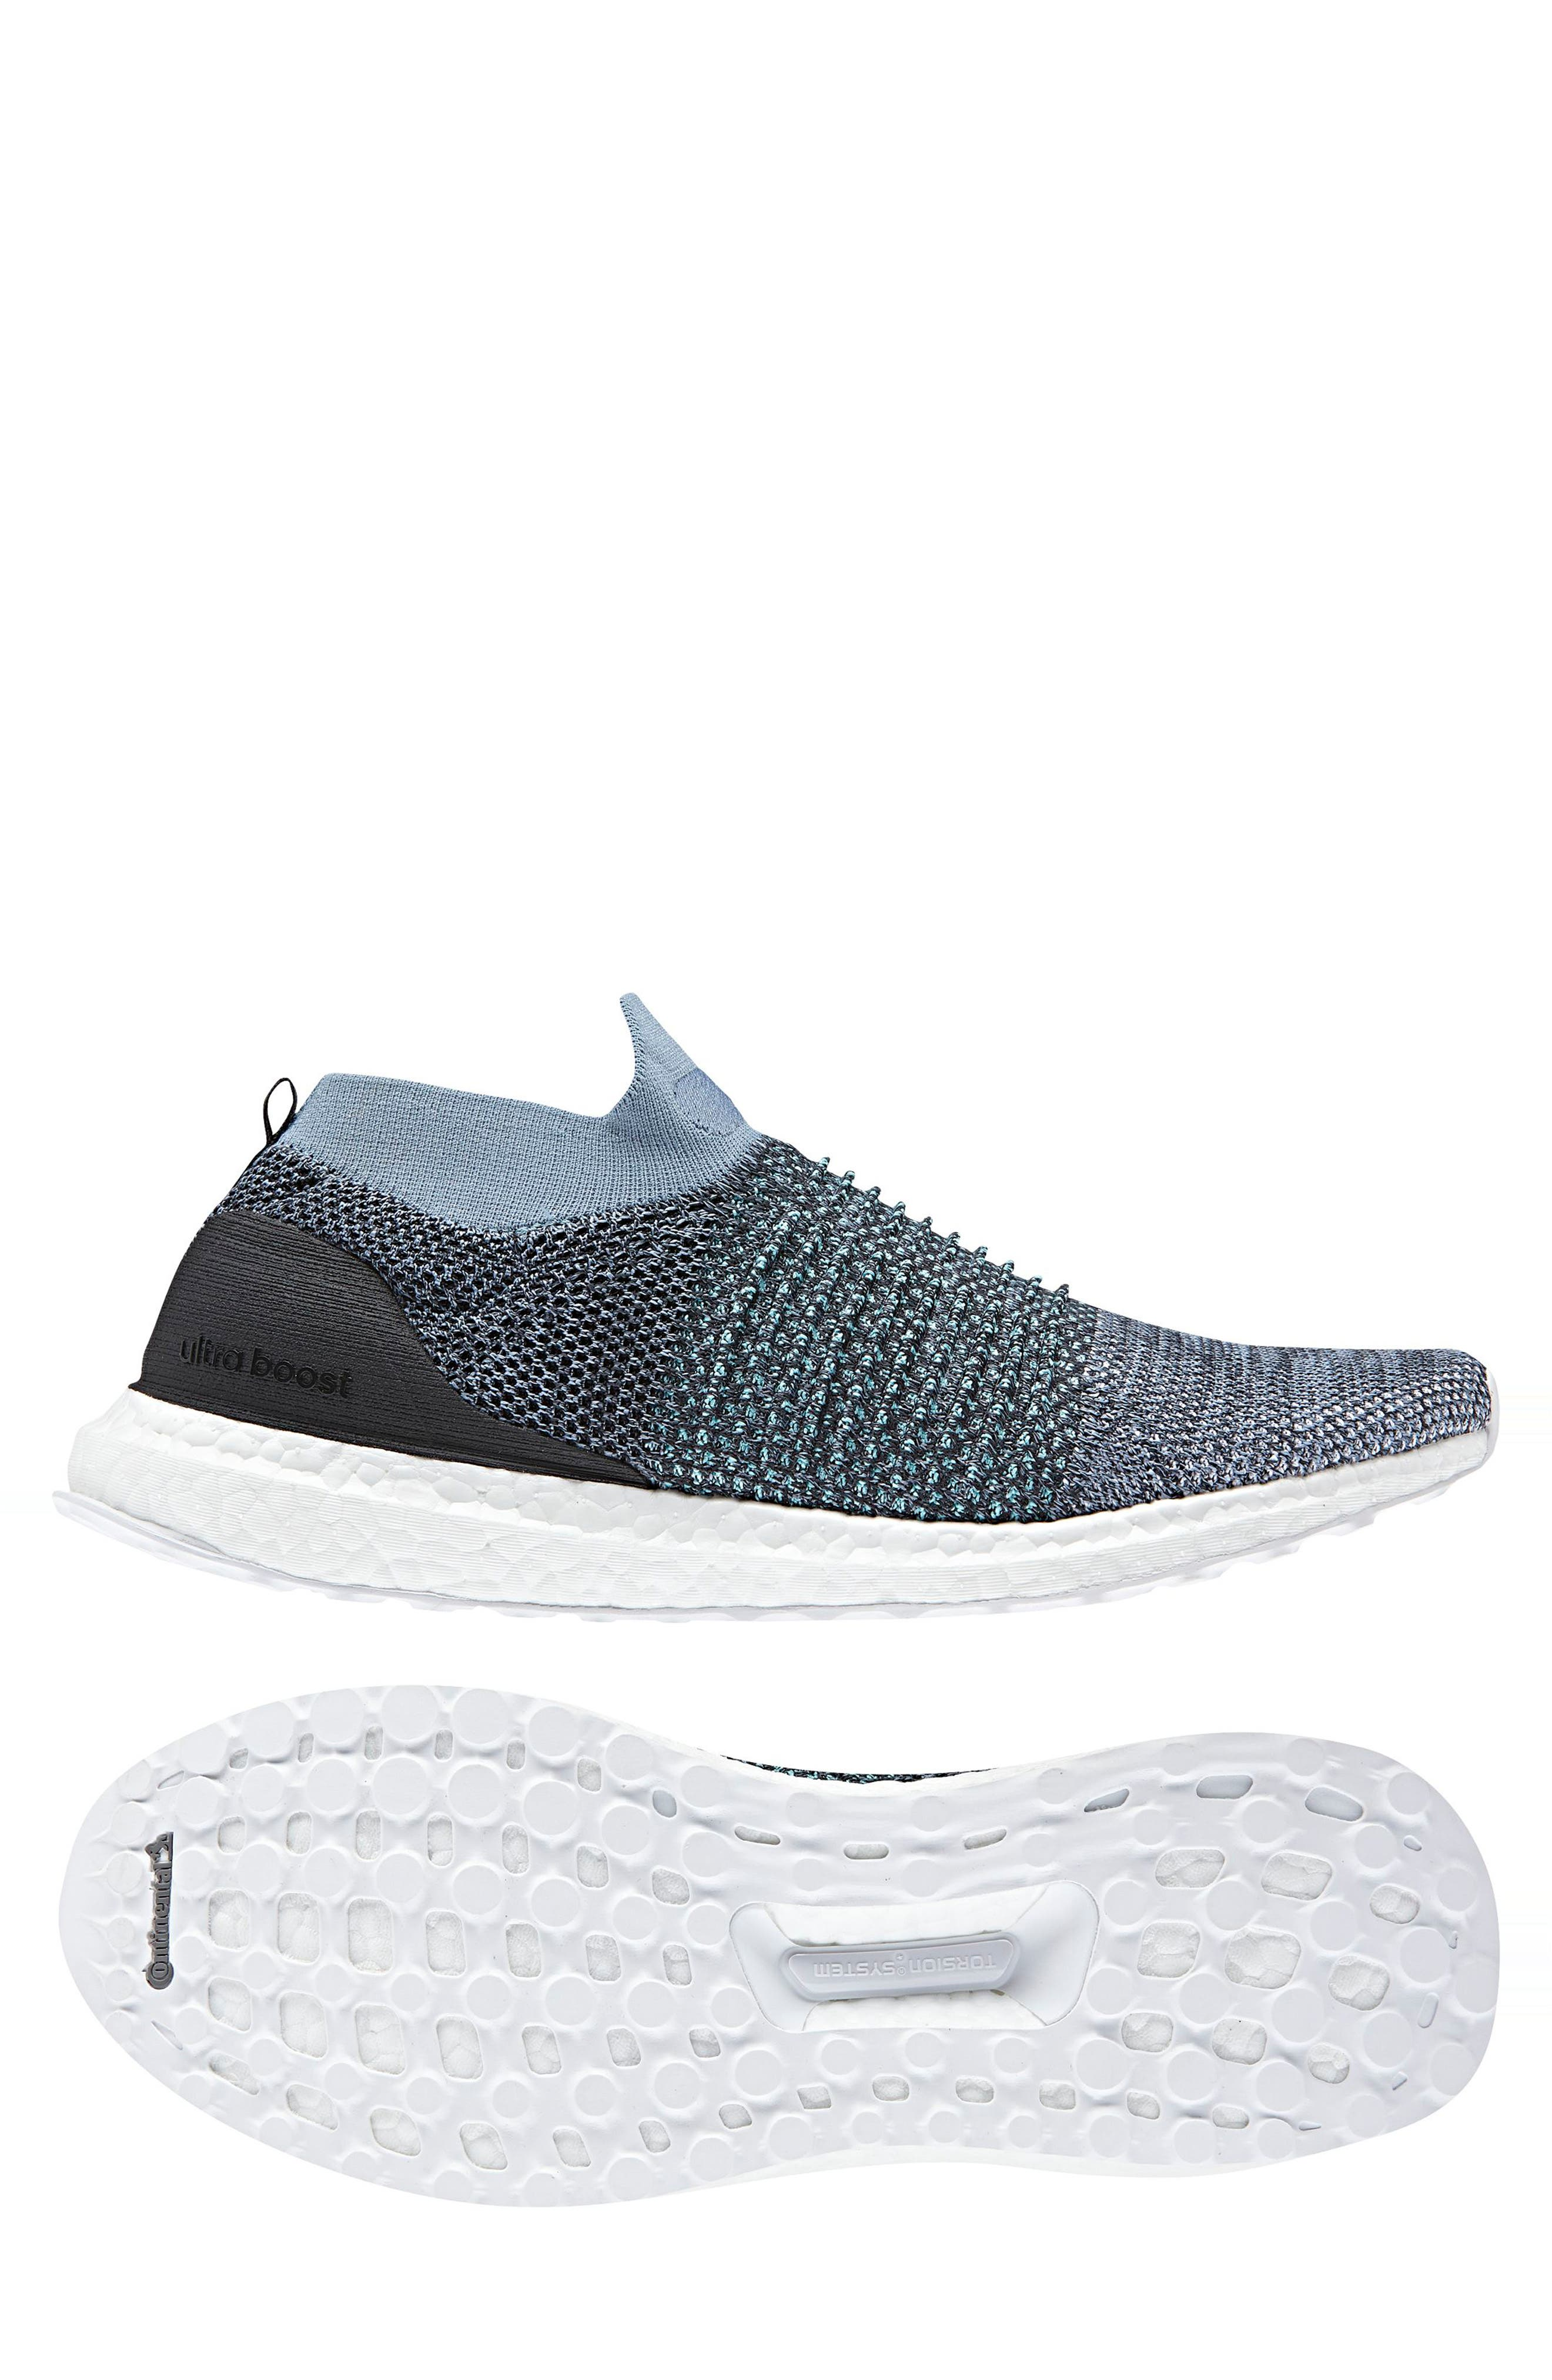 UltraBoost Laceless Running Shoe,                             Alternate thumbnail 2, color,                             Raw Grey/ Carbon/ Blue Spirit